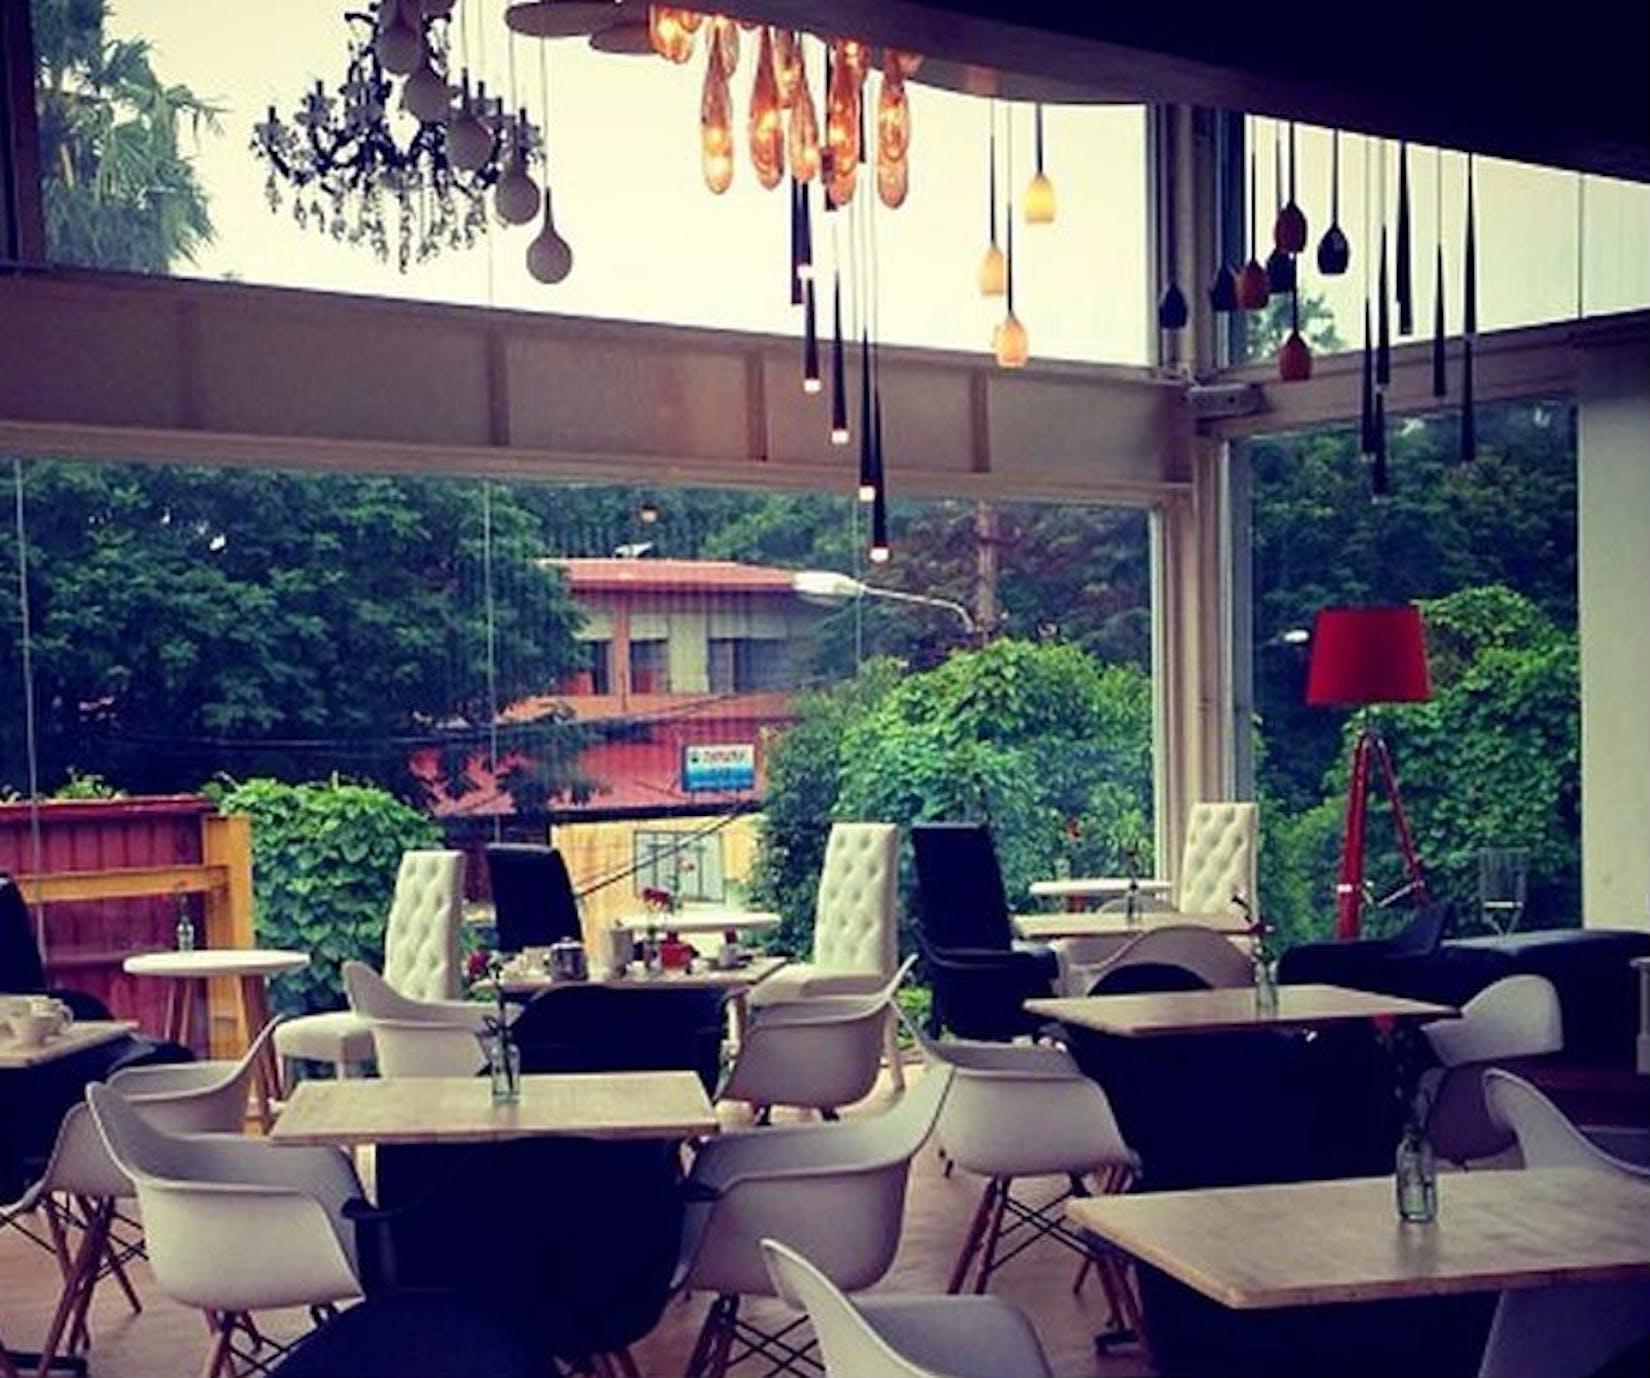 Cafe Terrace | yathar